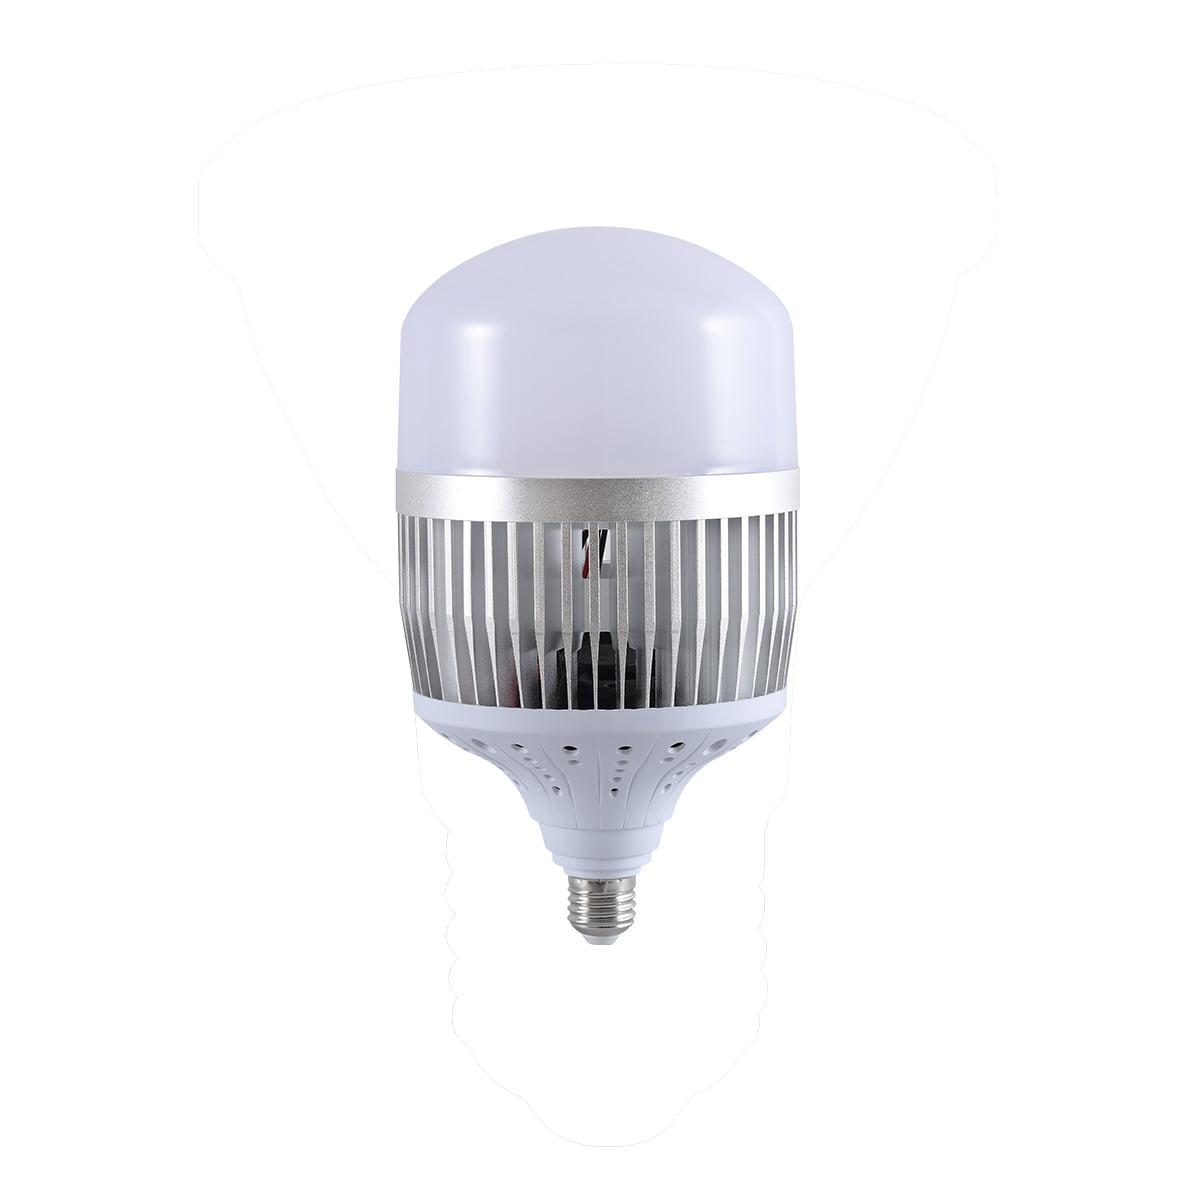 MBLED Lampada Bulbo High Bay 150w 6500k 6500lm E27